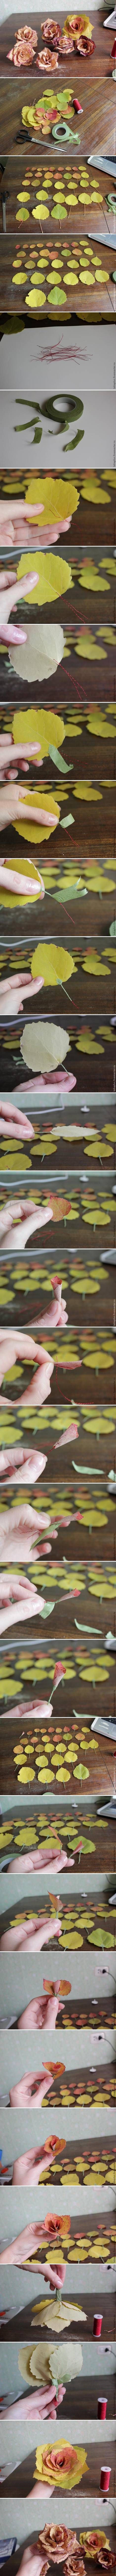 DIY Golden Autumn Rose DIY Projects | UsefulDIY.com Follow Us on Facebook ==> http://www.facebook.com/UsefulDiy